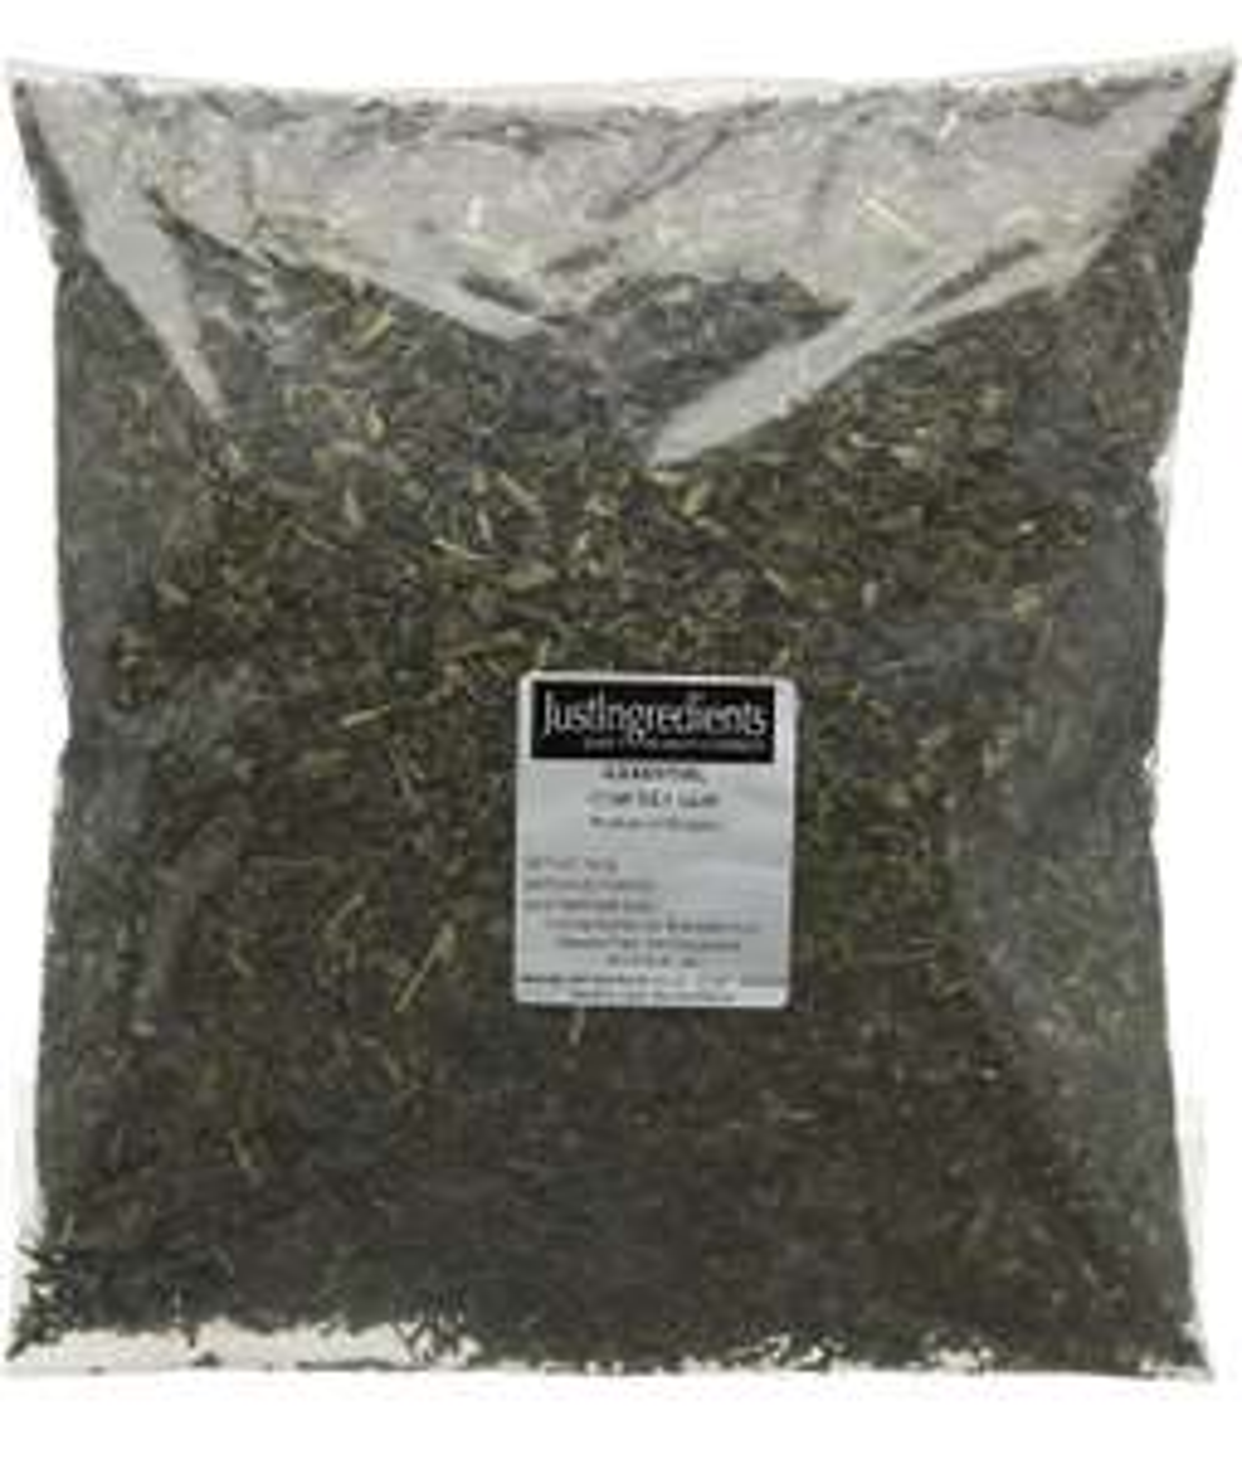 JustIngredients Essentials Comfrey Leaf, 500 g £1.91 (+£4.49 Non Prime) @ Amazon